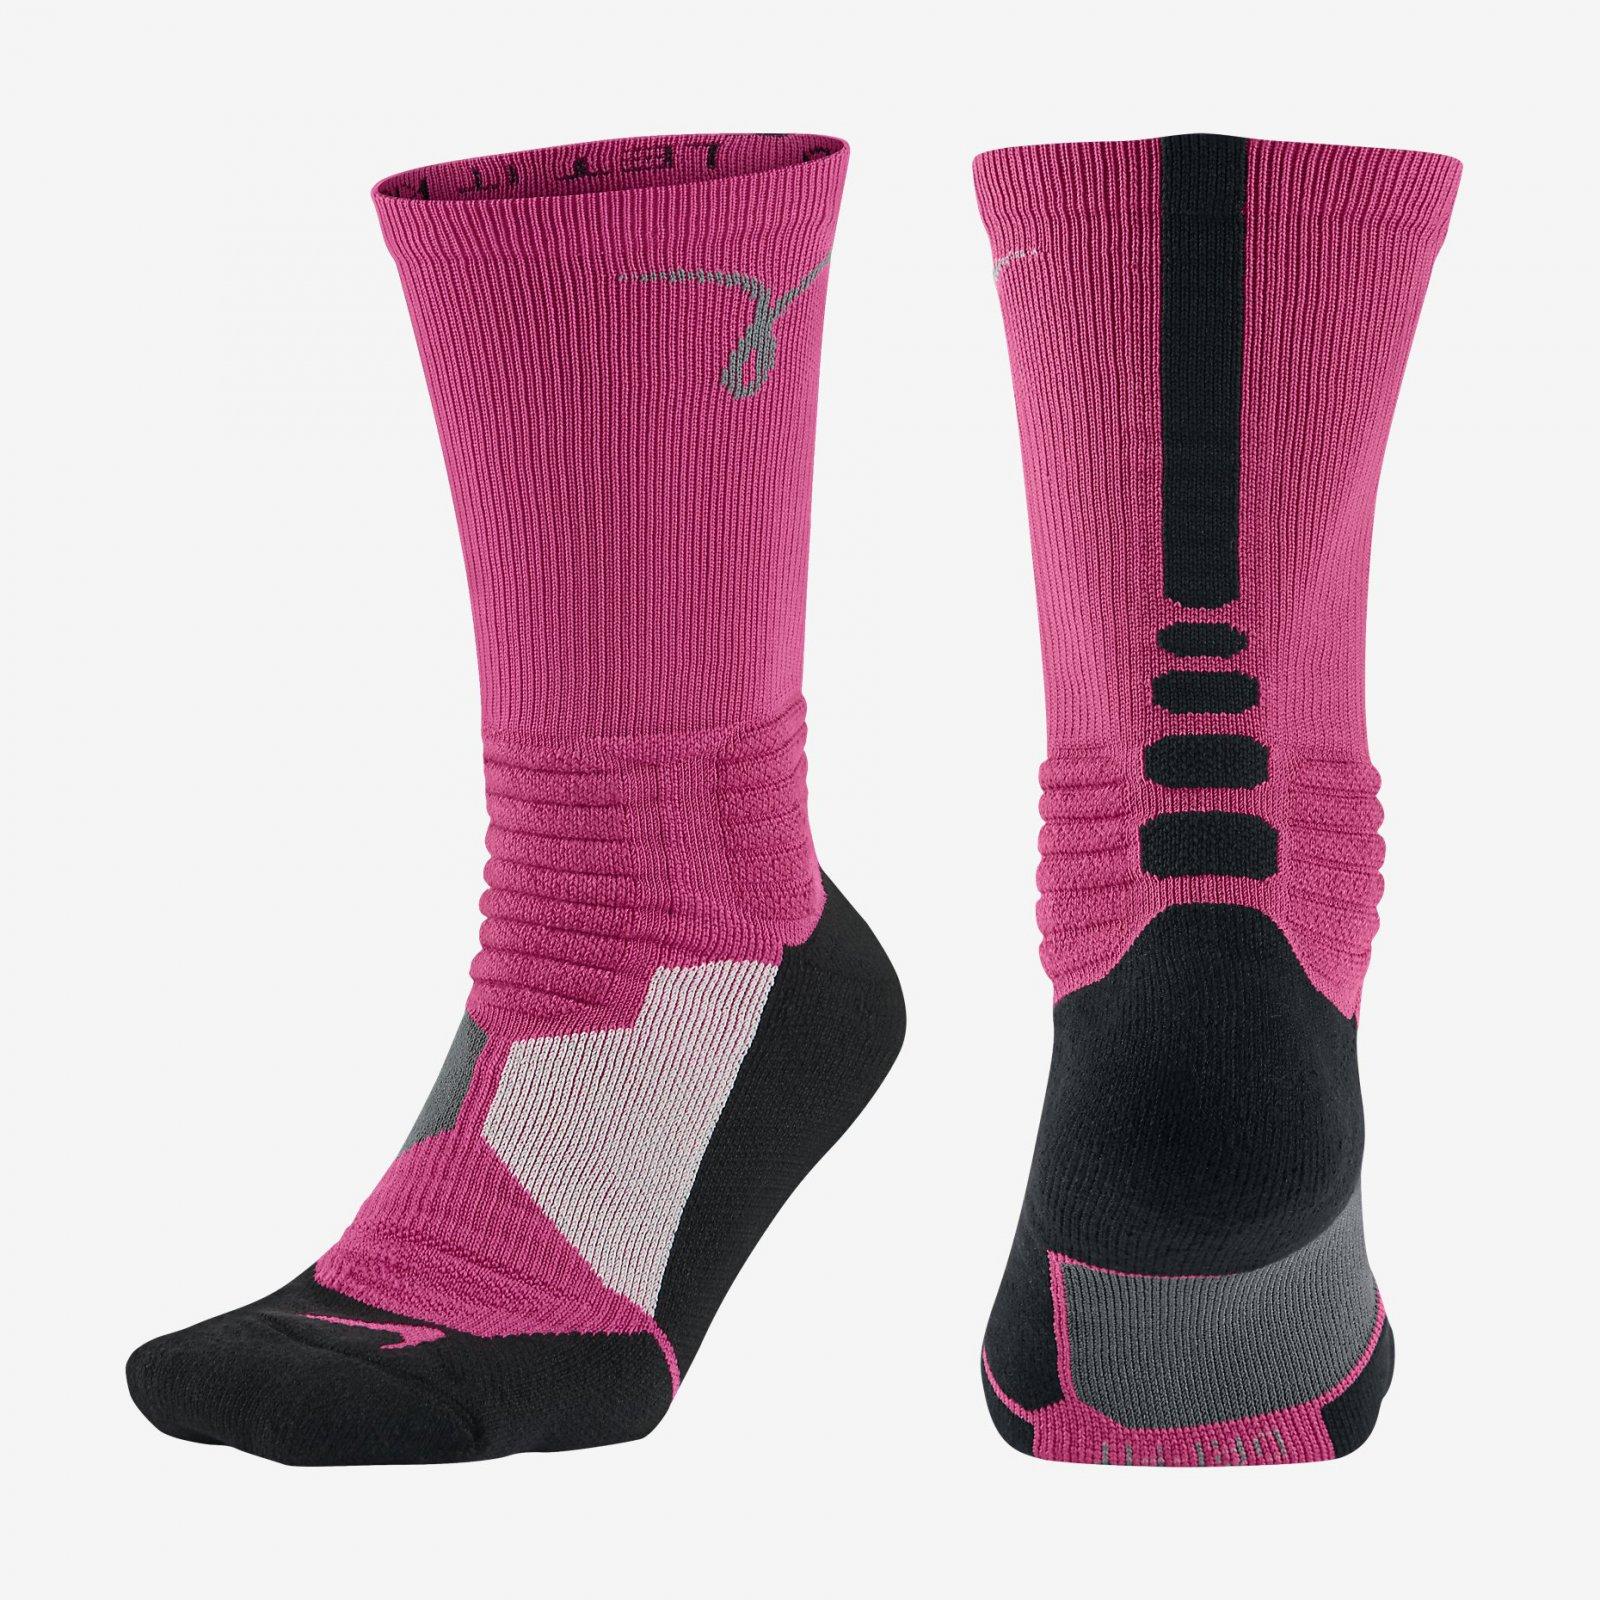 03cbfdefee2b2 Details about Nike Kay Yow Hyper Elite Basketball Think Pink White Crew  Socks SX4967-601